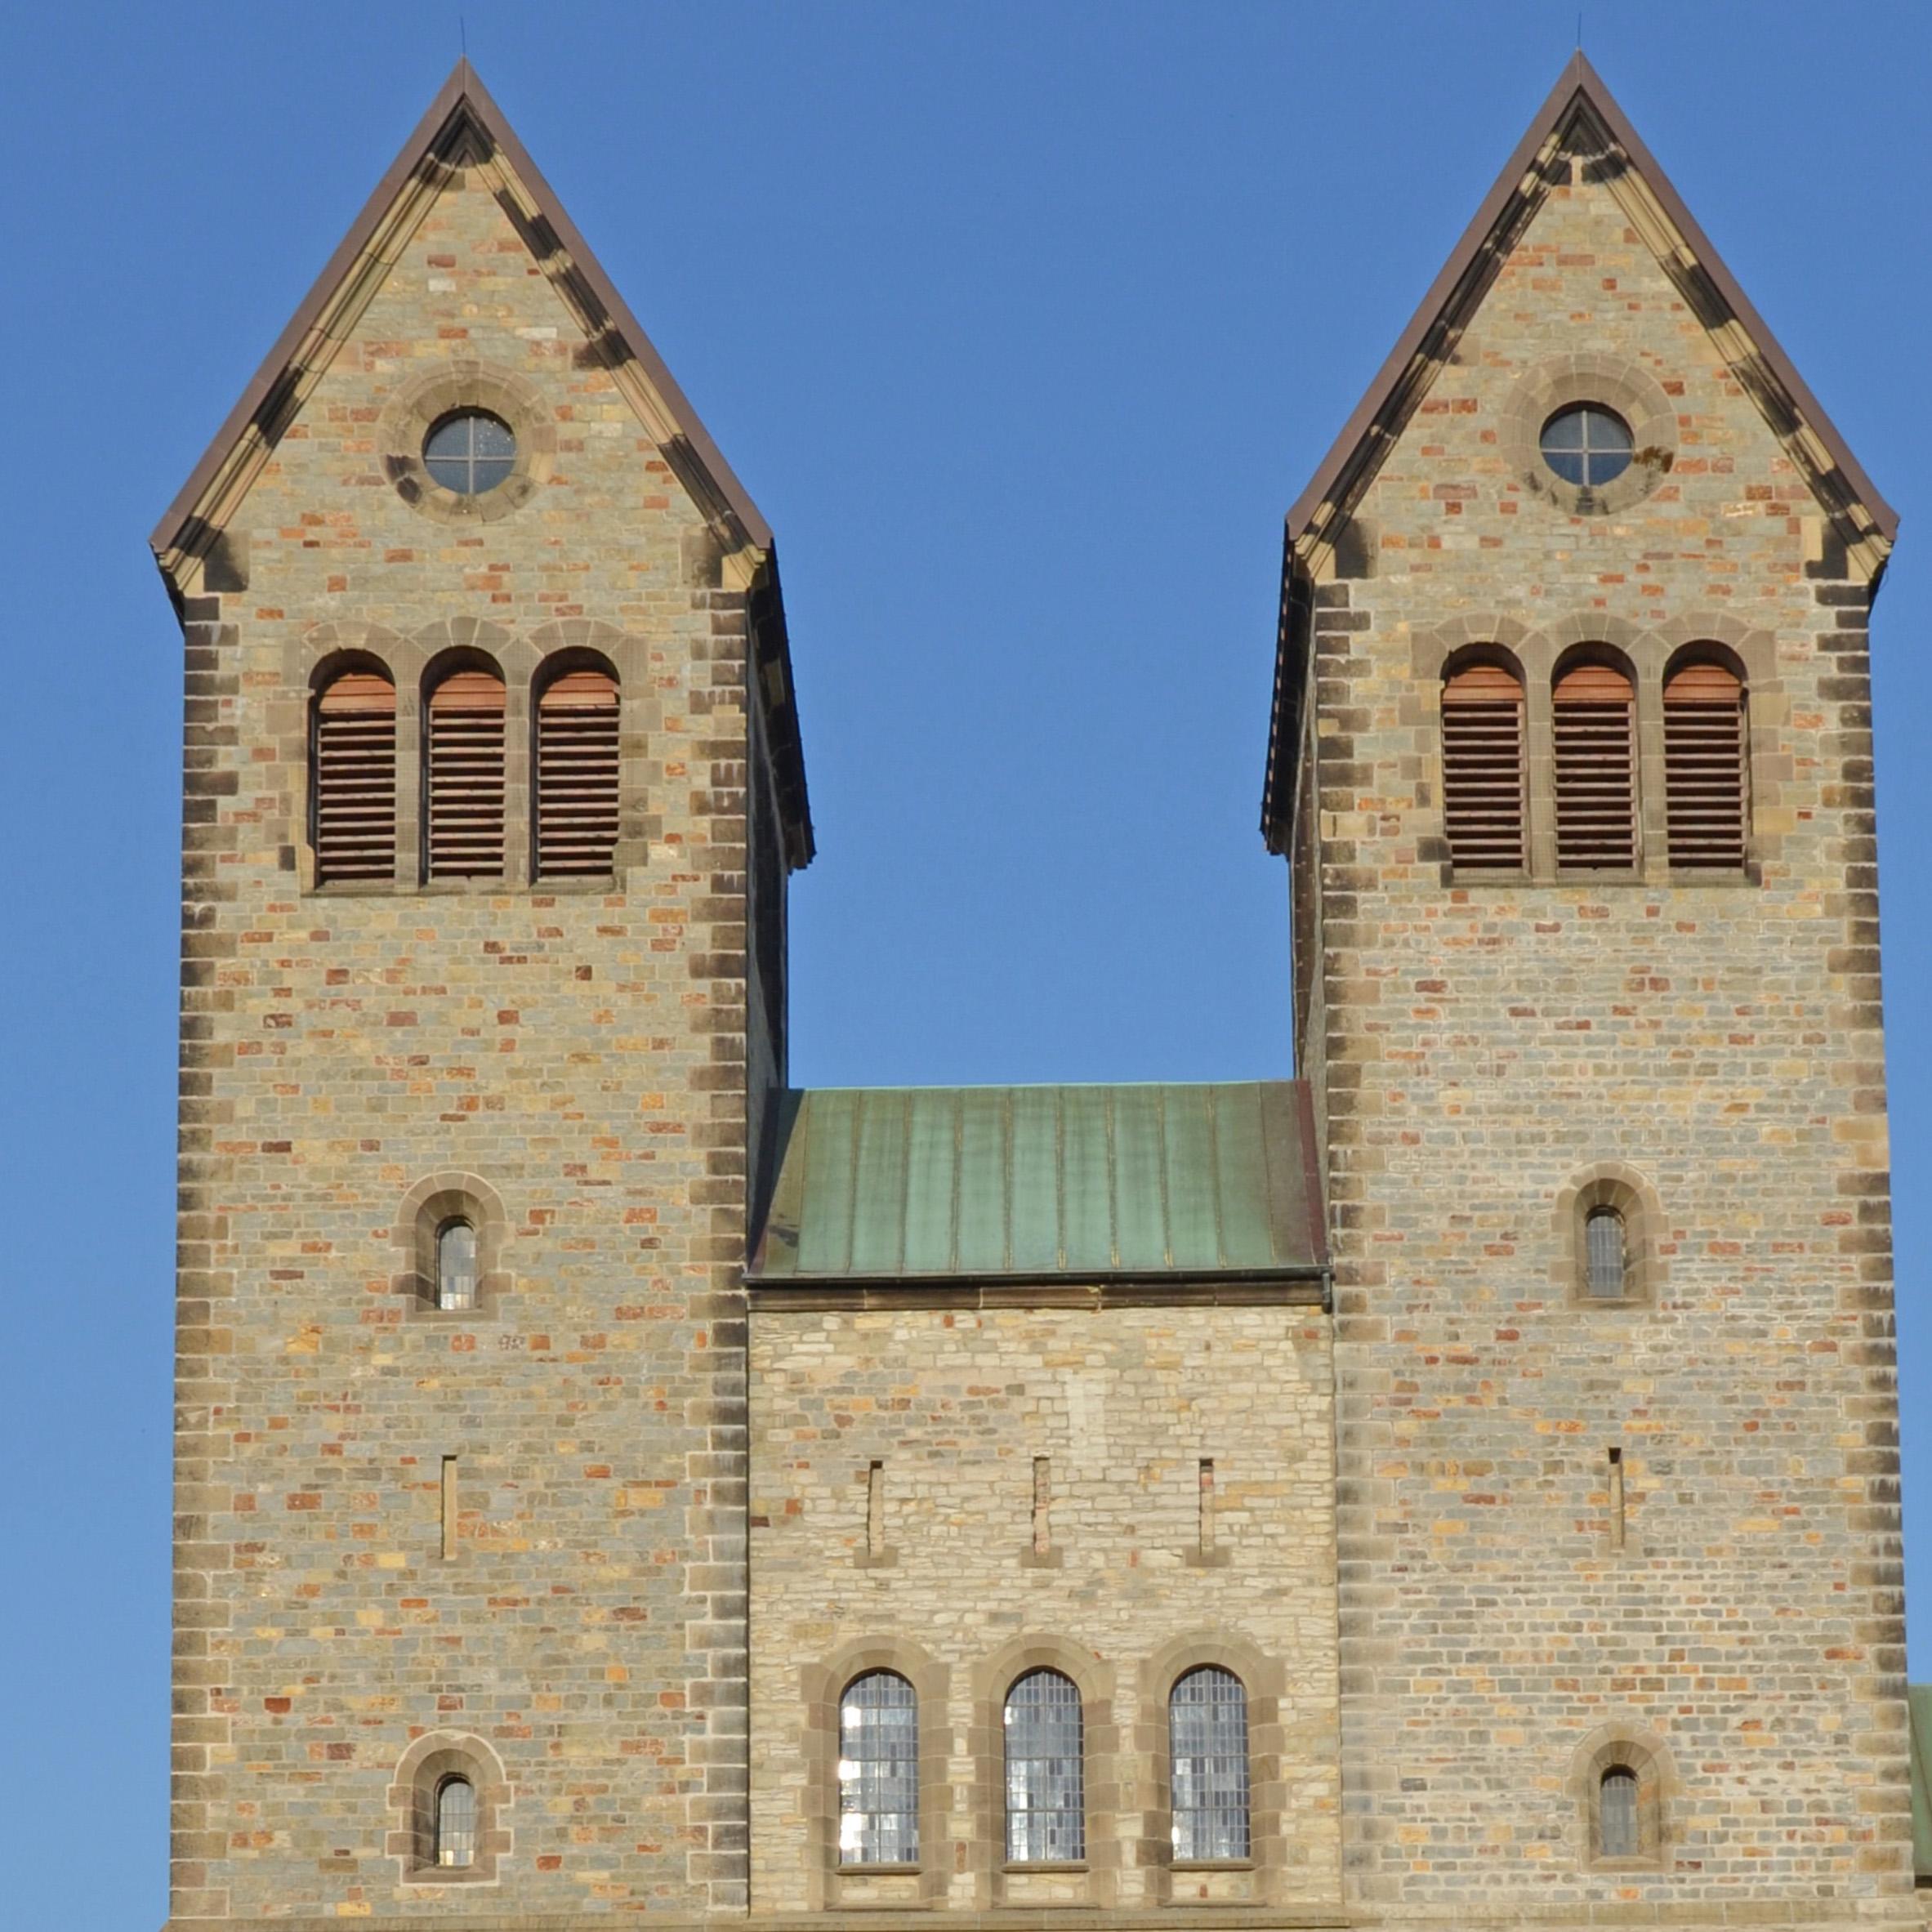 Abdinghofkirche Paderborn